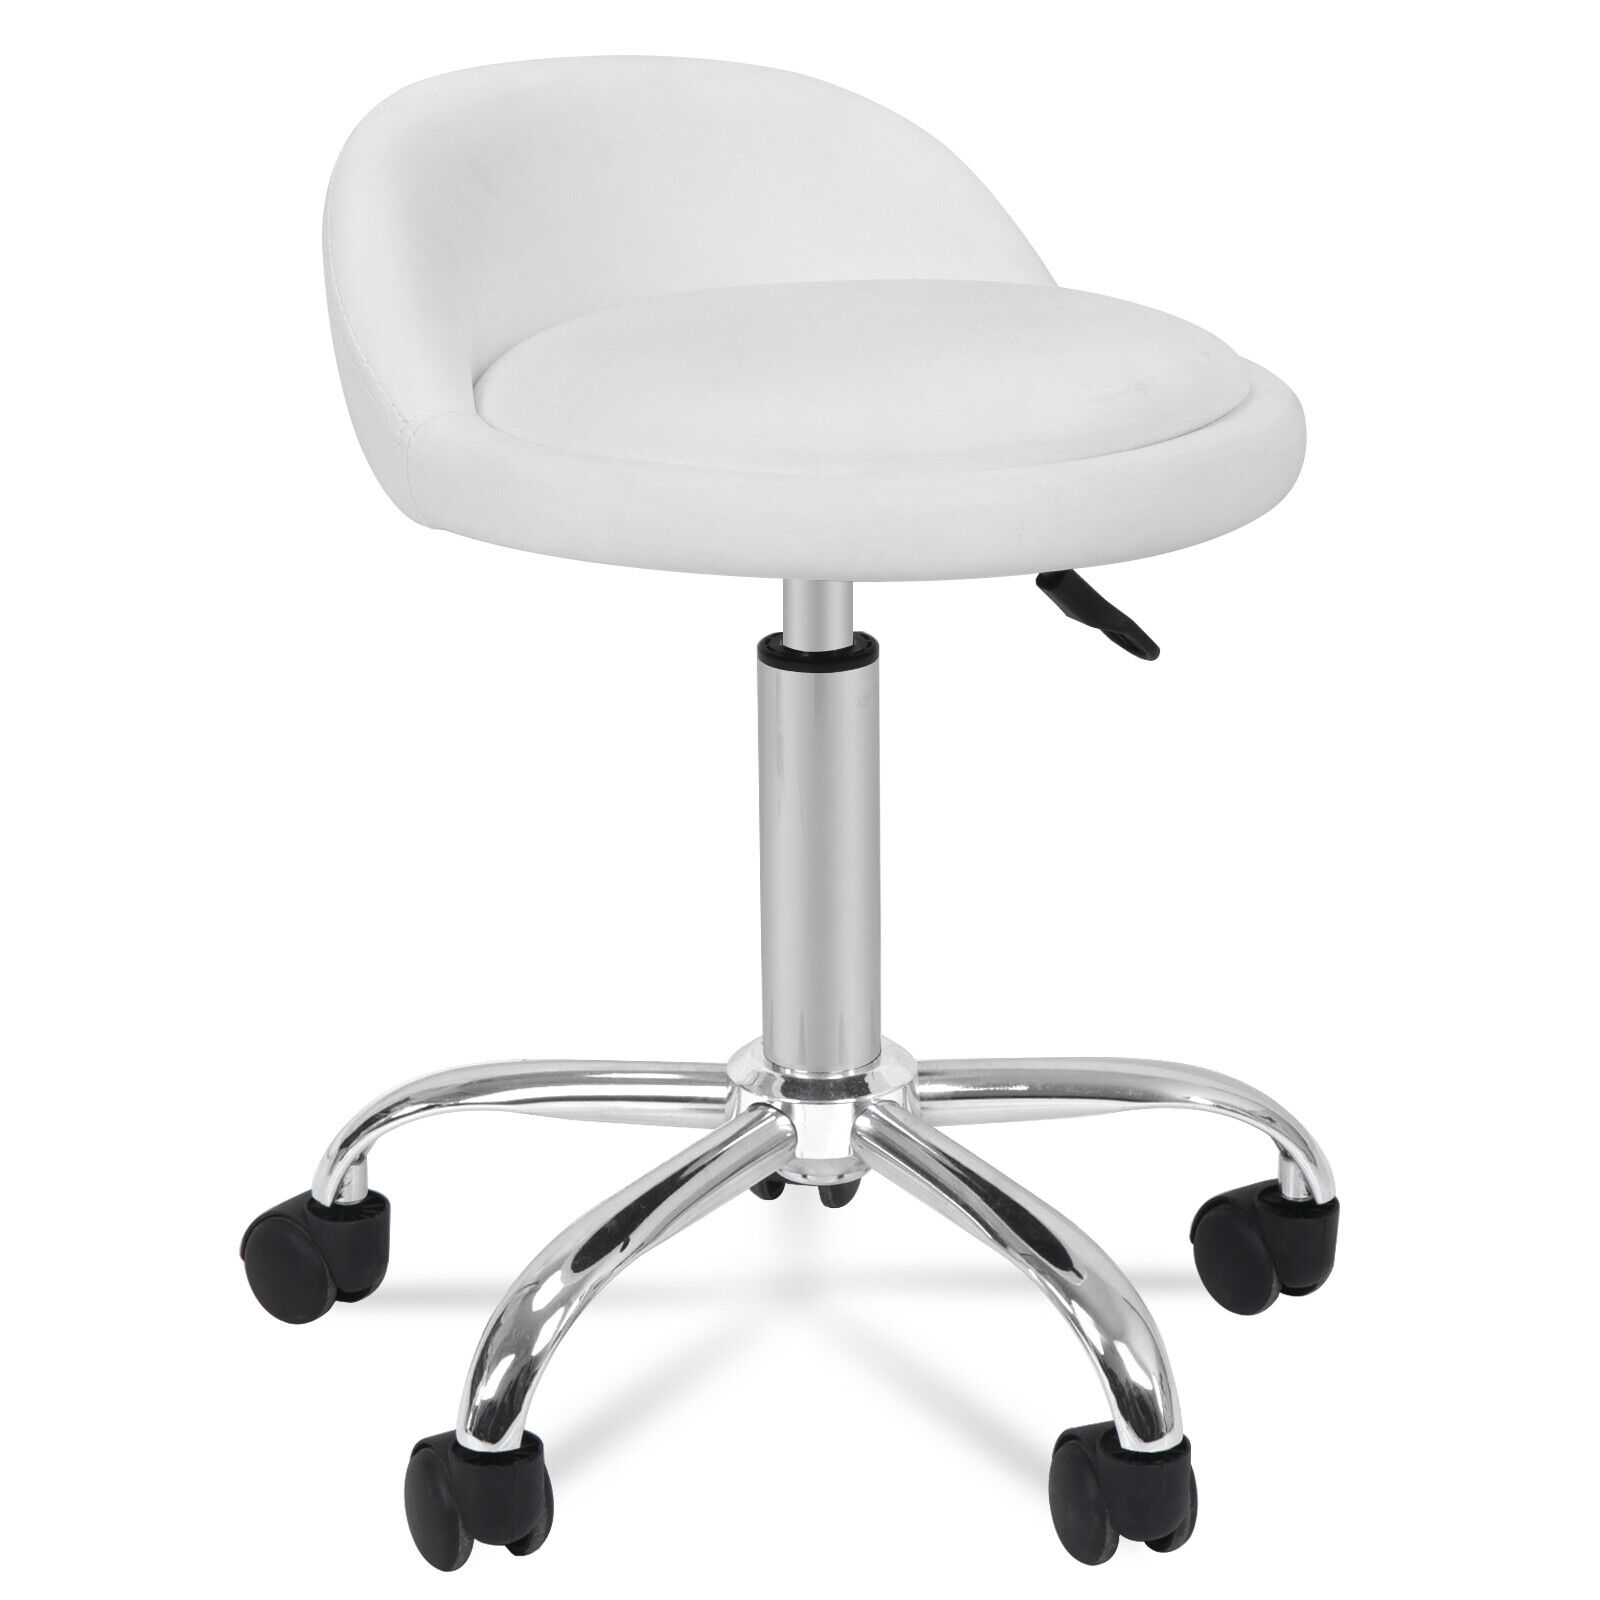 2X Adjustable Height Hydraulic Rolling Swivel Stool Spa Salon Chair w/Back Rest Health & Beauty